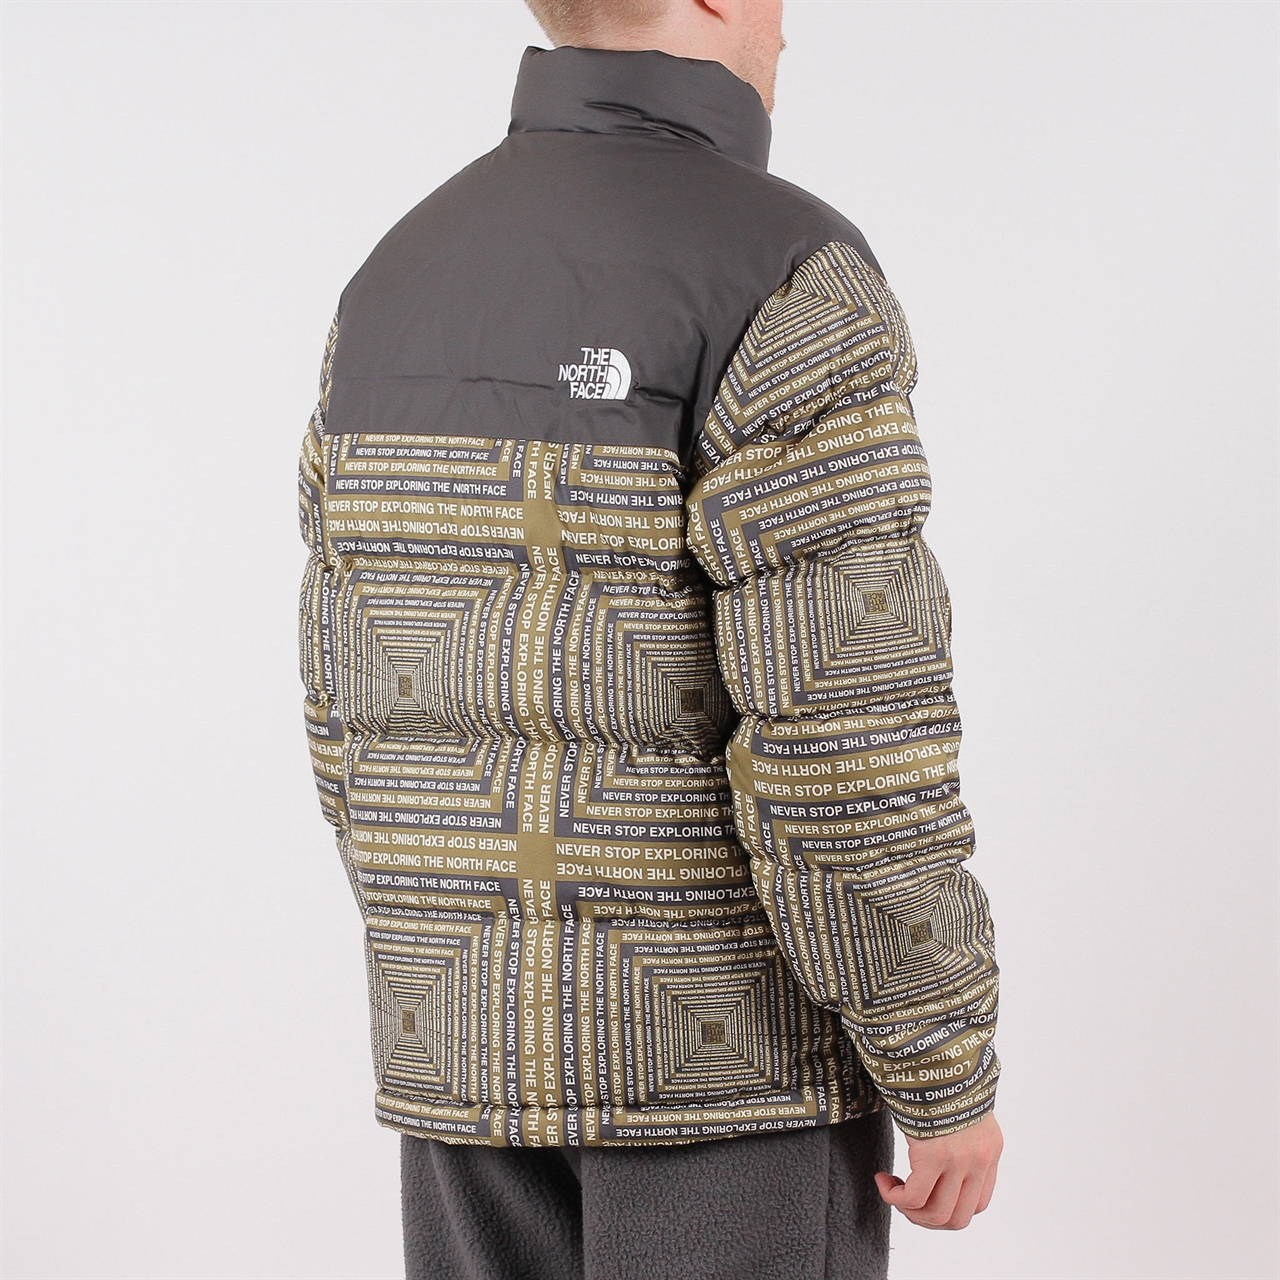 70bee4926c Shelta - The North Face 1992 Nuptse Jacket Print (T92ZWE5XN)